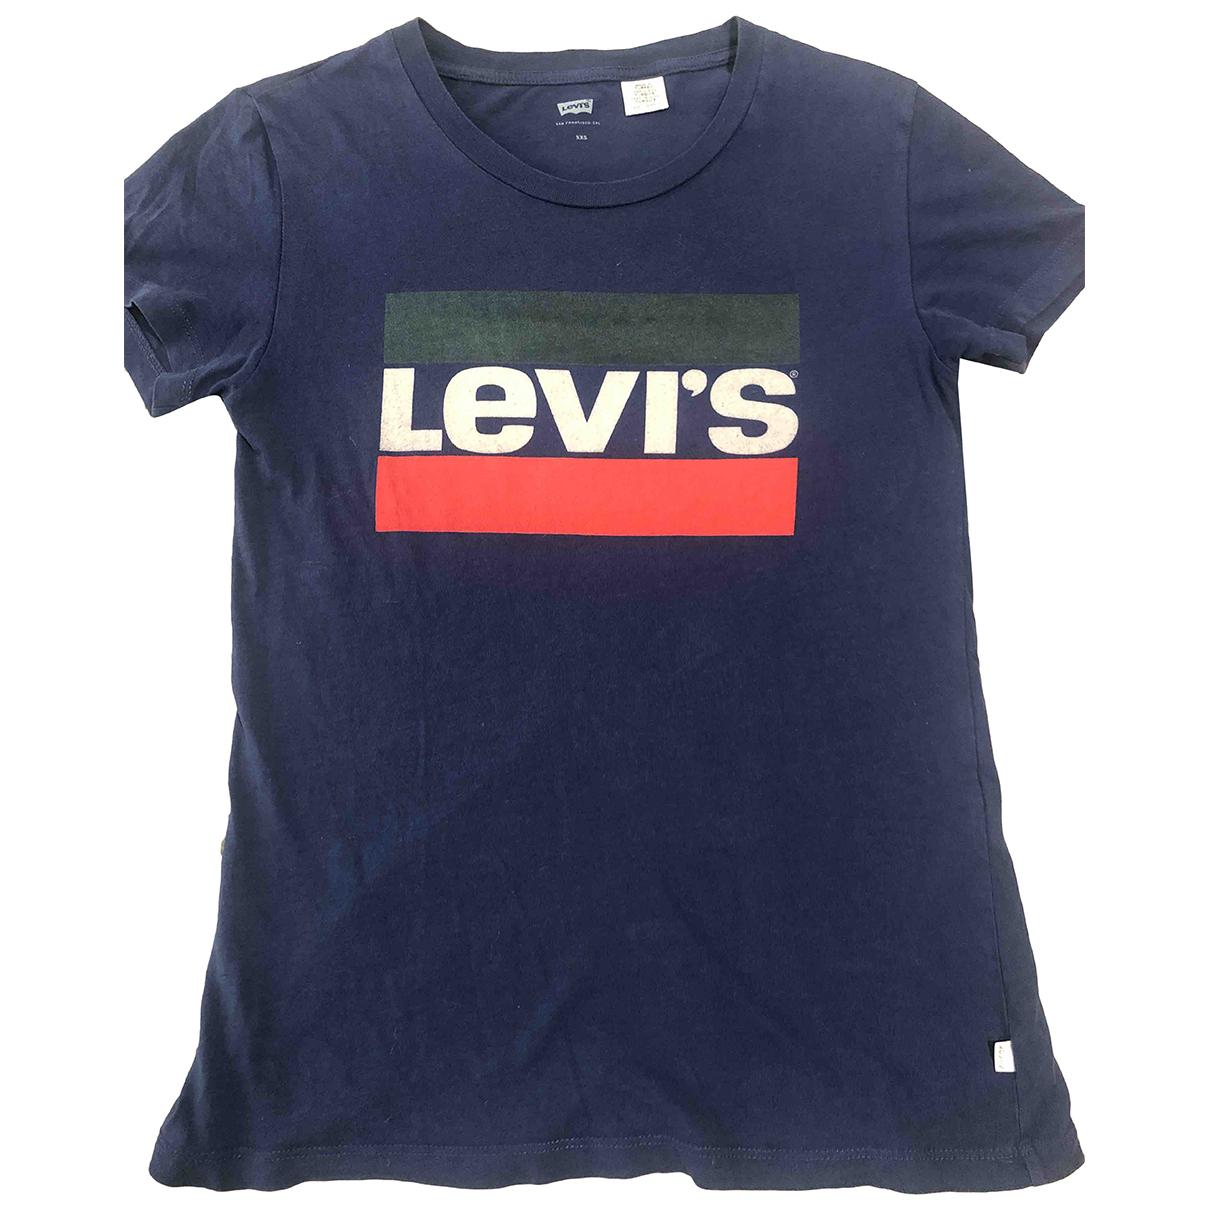 Levis N Blue Cotton  top for Women XXS International